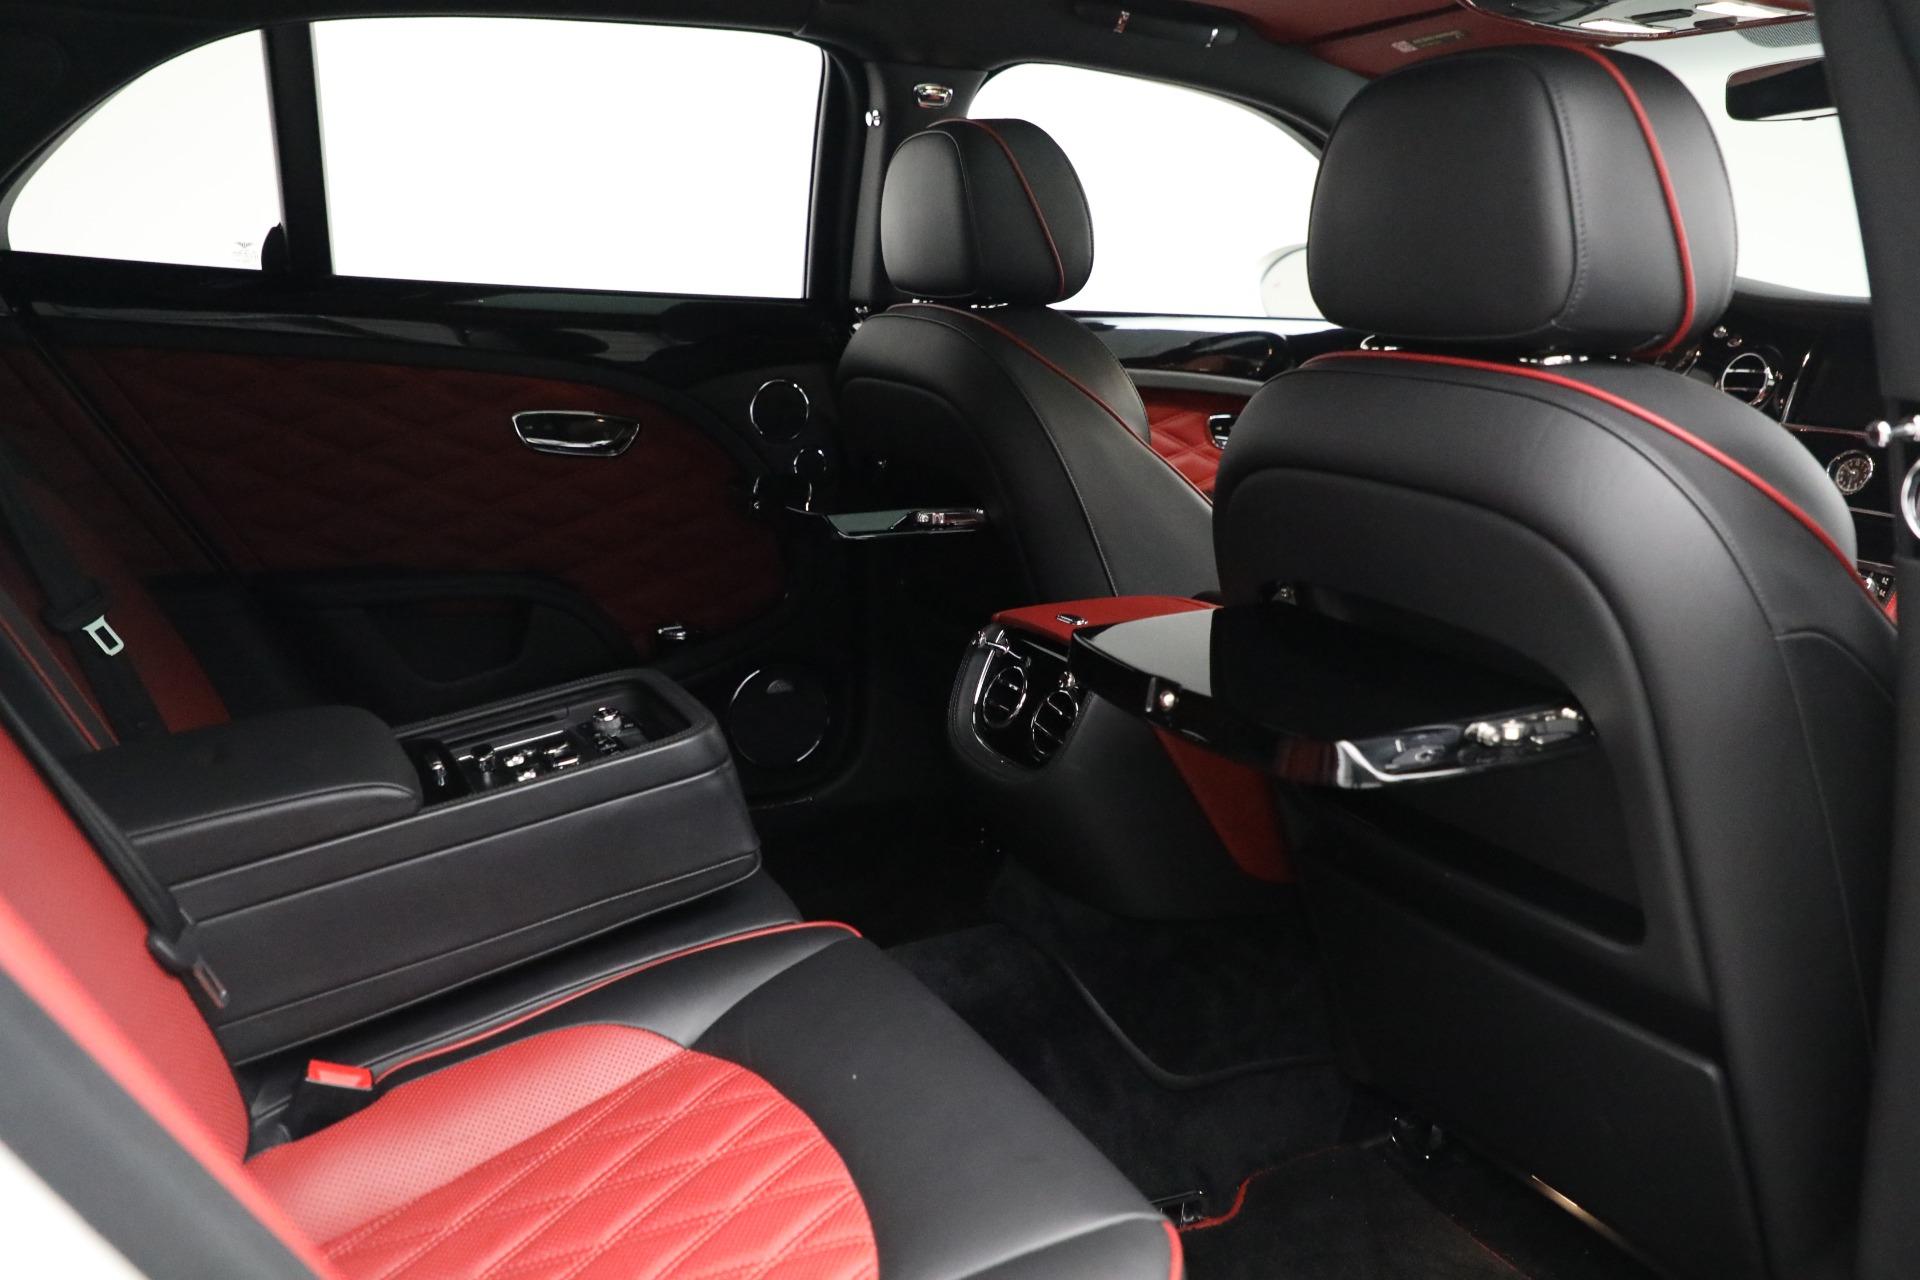 Used 2018 Bentley Mulsanne Speed For Sale In Westport, CT 2075_p24